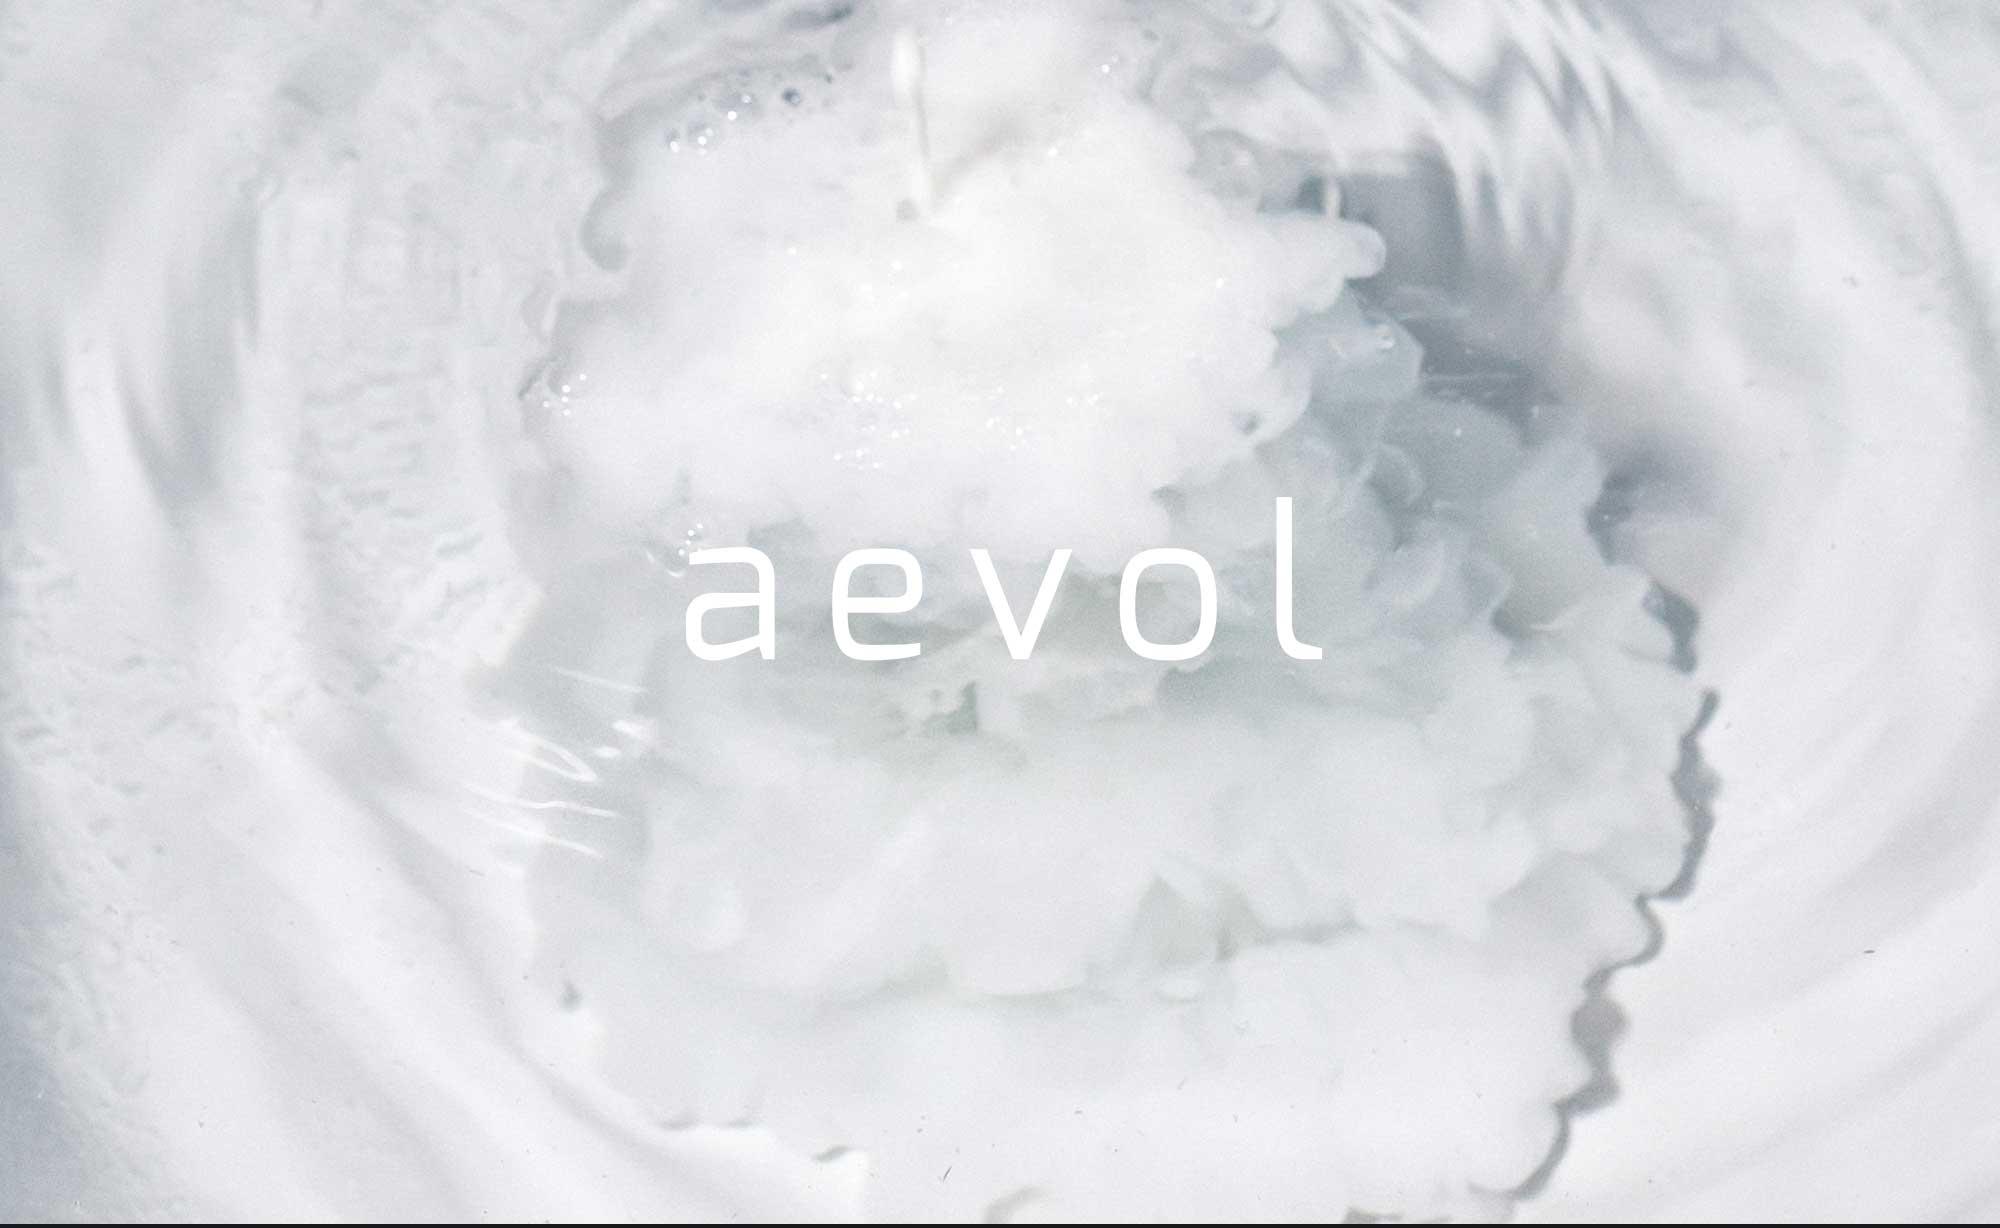 ©-Chris-Rae-Design-Aevol-Brand-and-Identity-Logo-Design-01.jpg